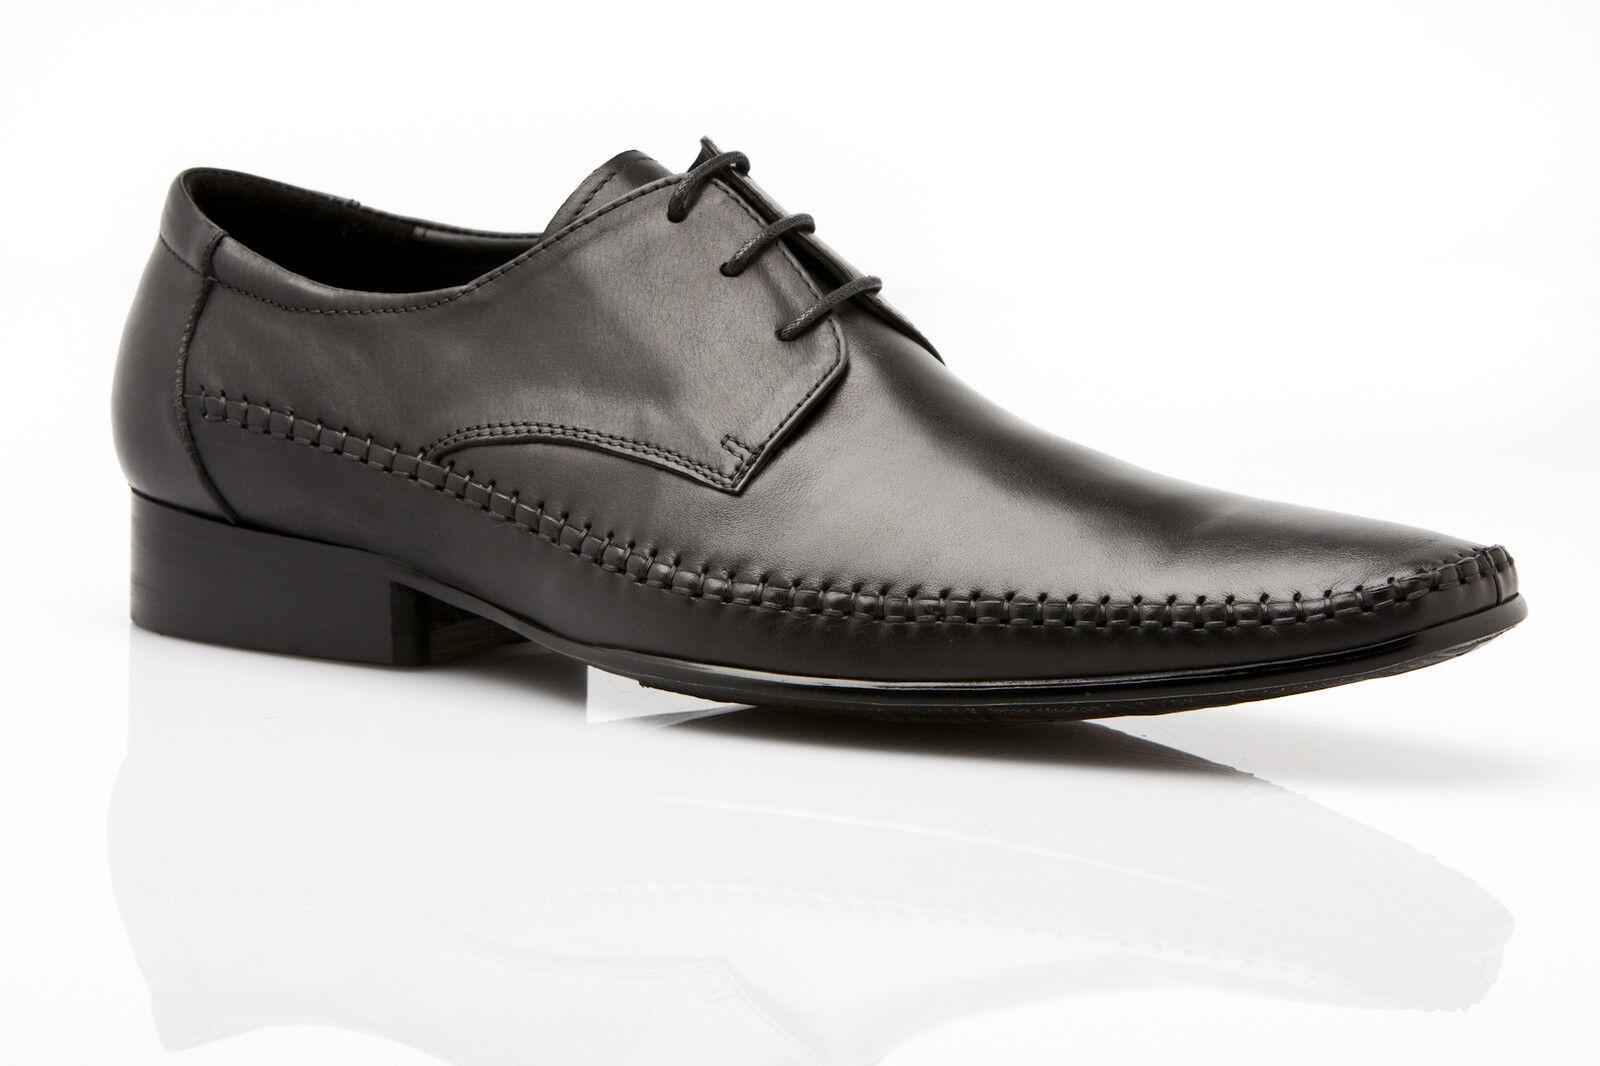 MENS NIKO AUSTRALIAN DESIGN ZASEL DRESS schwarz schwarz schwarz LEATHER LACE UPS FORMAL WORK schuhe 987f6e